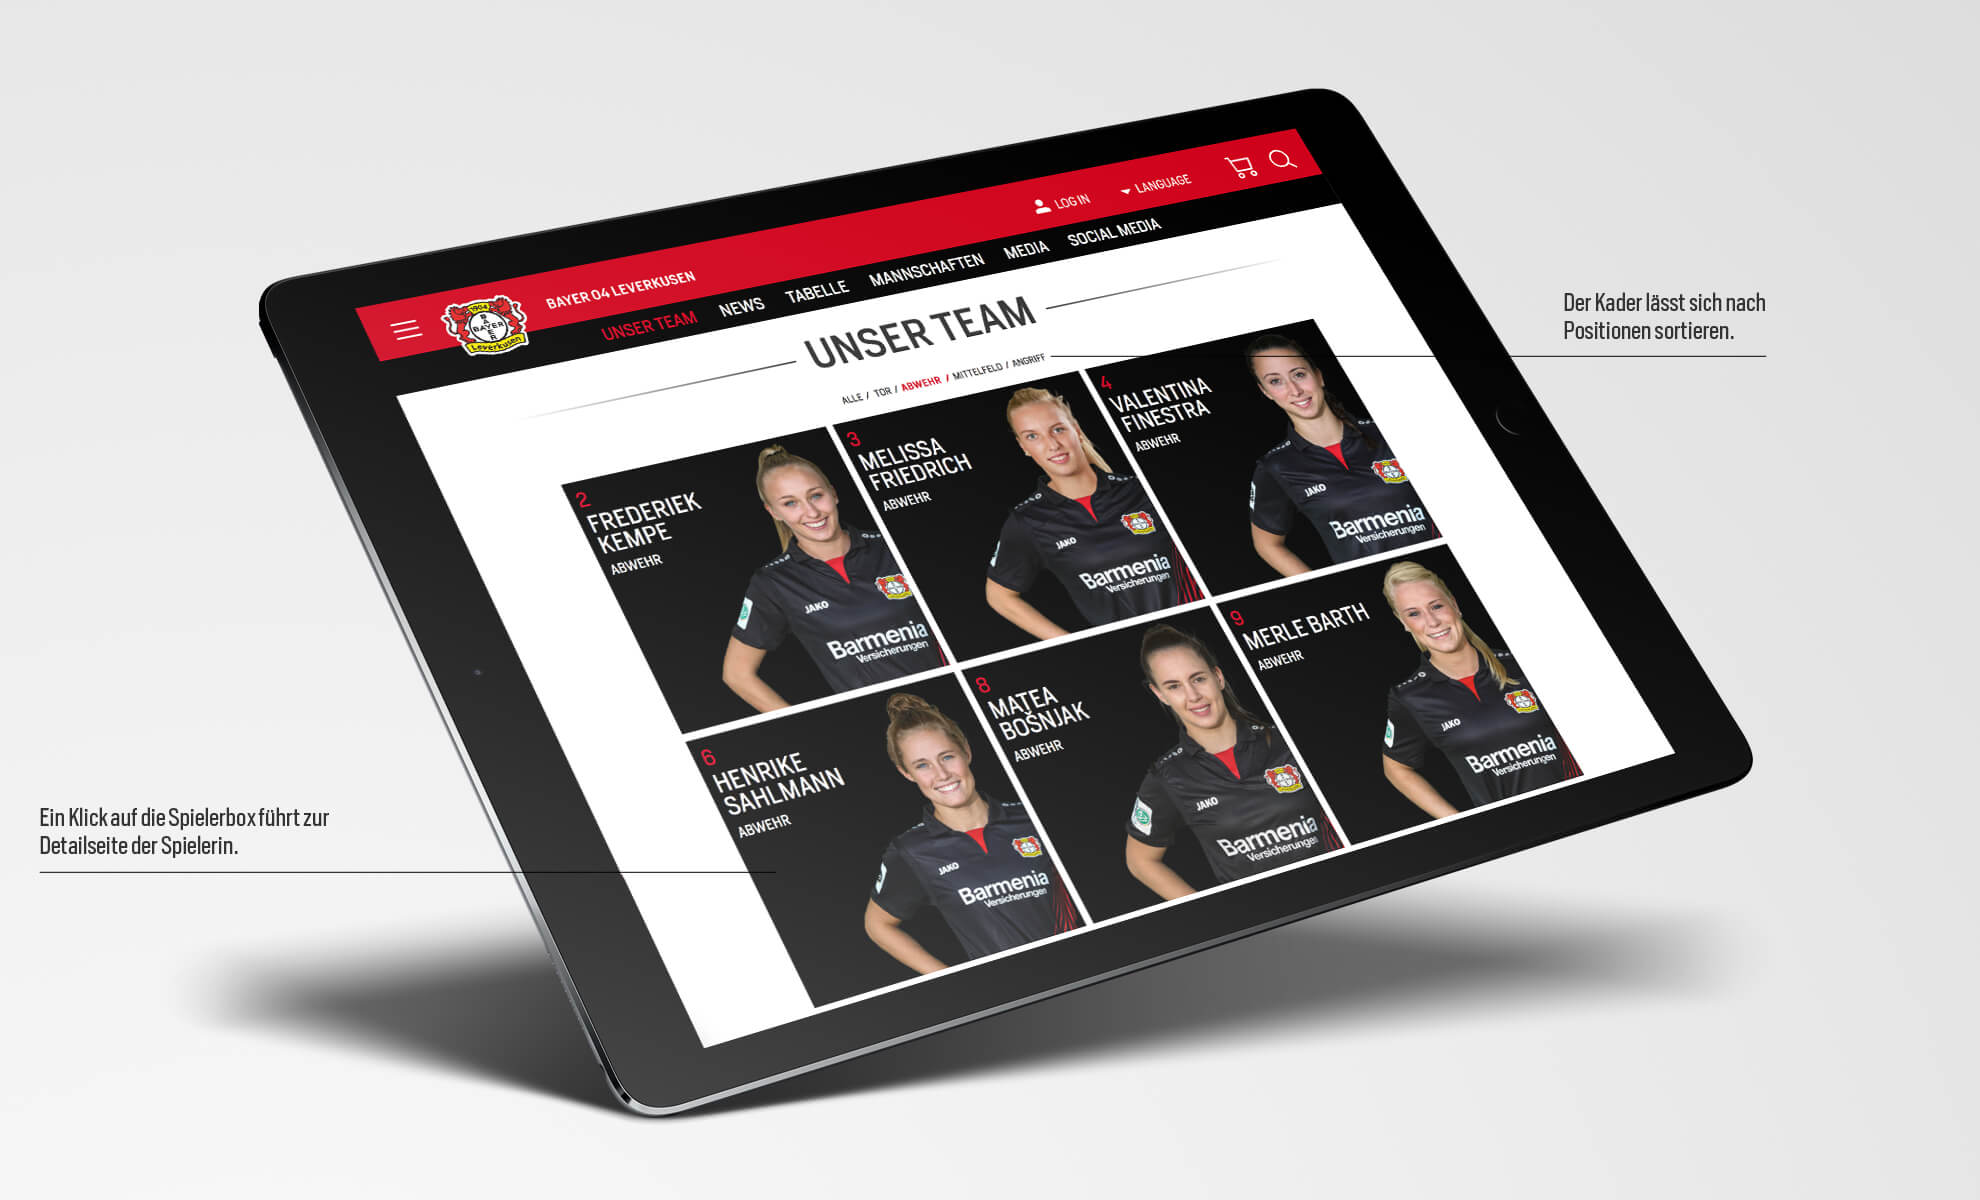 Bayer 04 Leverkusen Website, Relaunch, Redesign, Webdesign, UX, UI, ipad, Filter